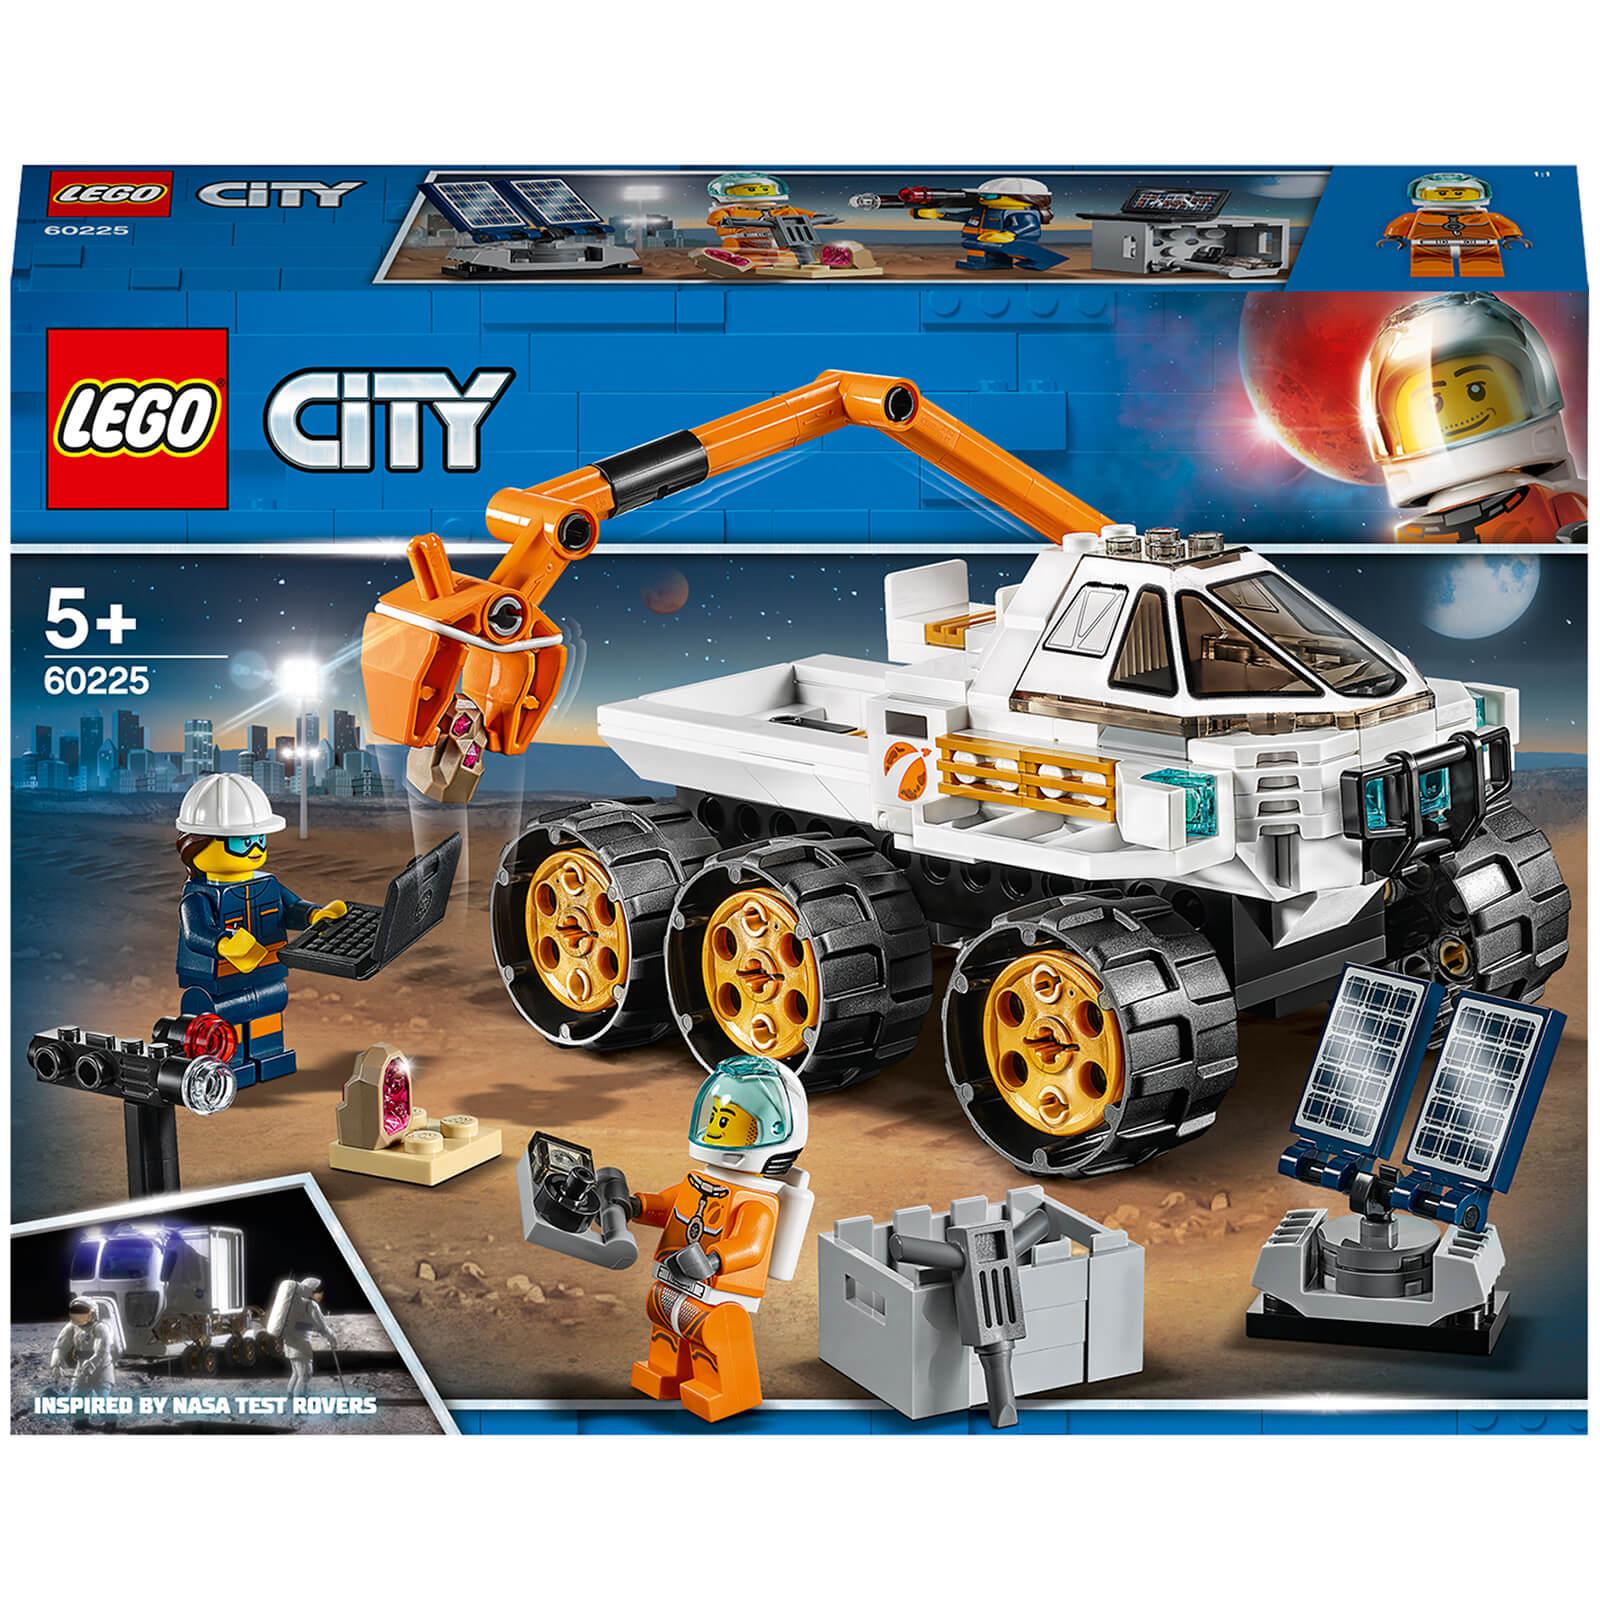 Lego City Rover Testing Drive Space Toy 60225 Toys Zavvi Uk